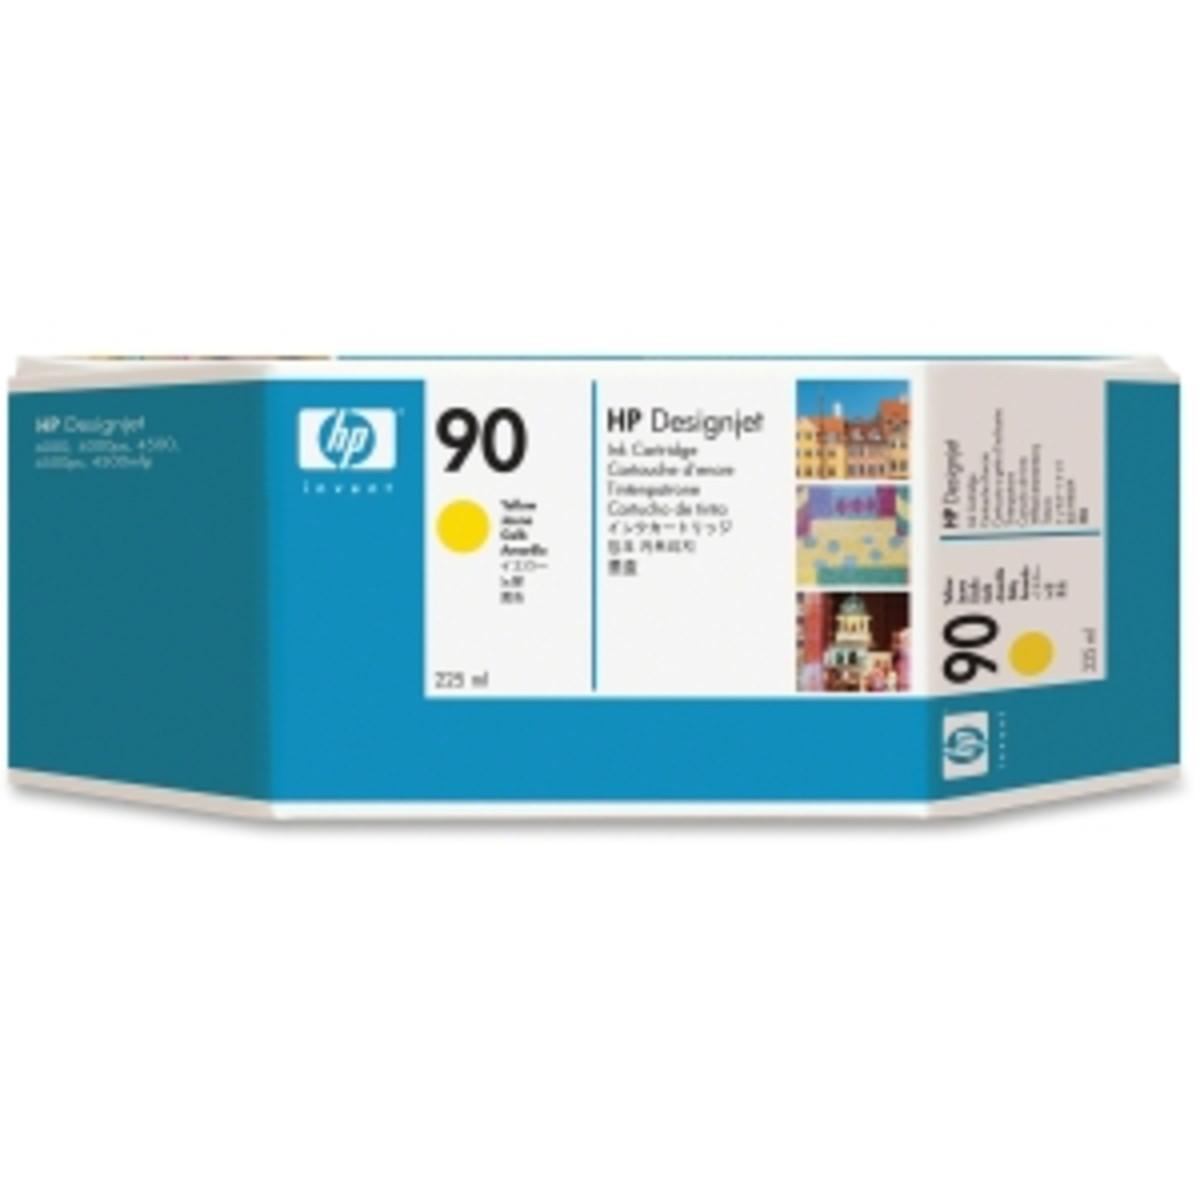 HP 90 (C5064A) Yellow Ink Cartridge